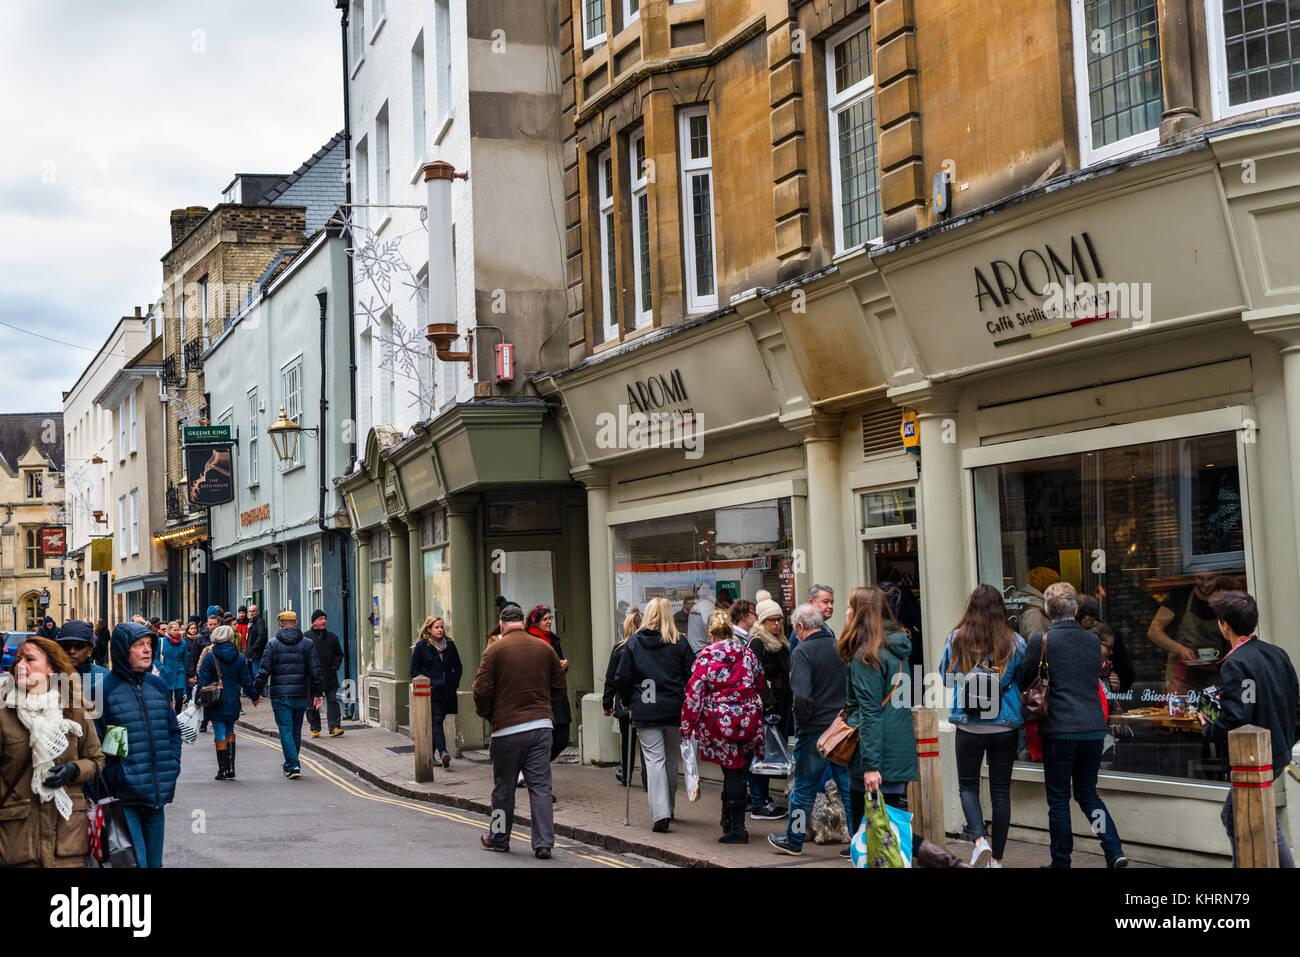 Cafes, pubs and restaurants on Benet street in Cambridge city centre, Cambridgeshire, England, UK. - Stock Image